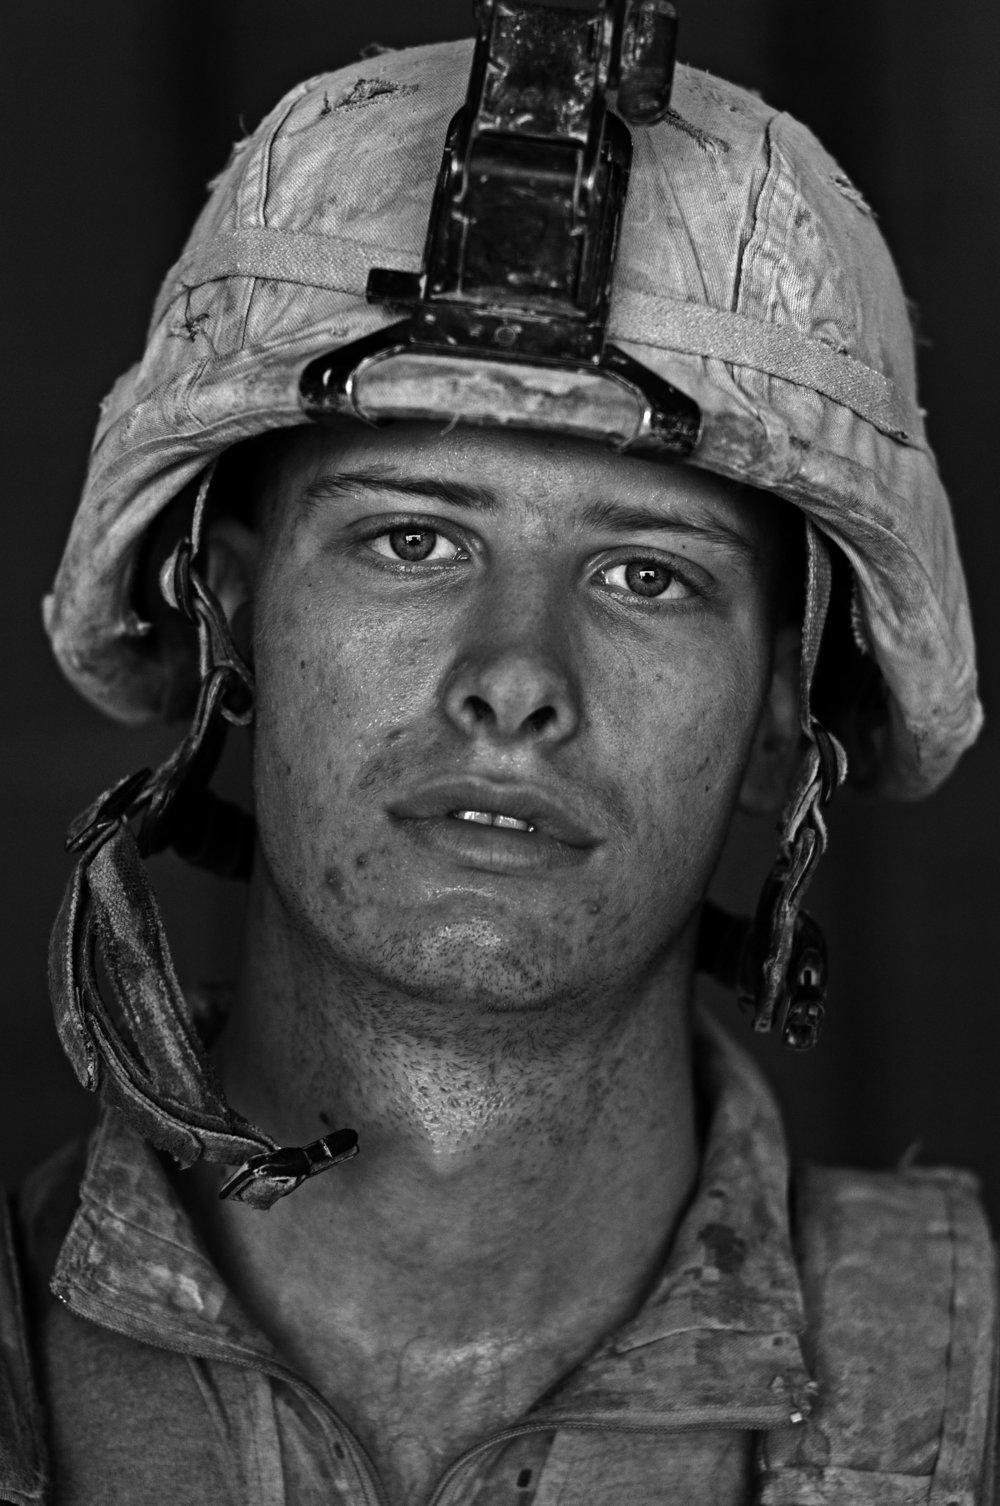 5-U.S. Marine Lcpl. Preston Calkins